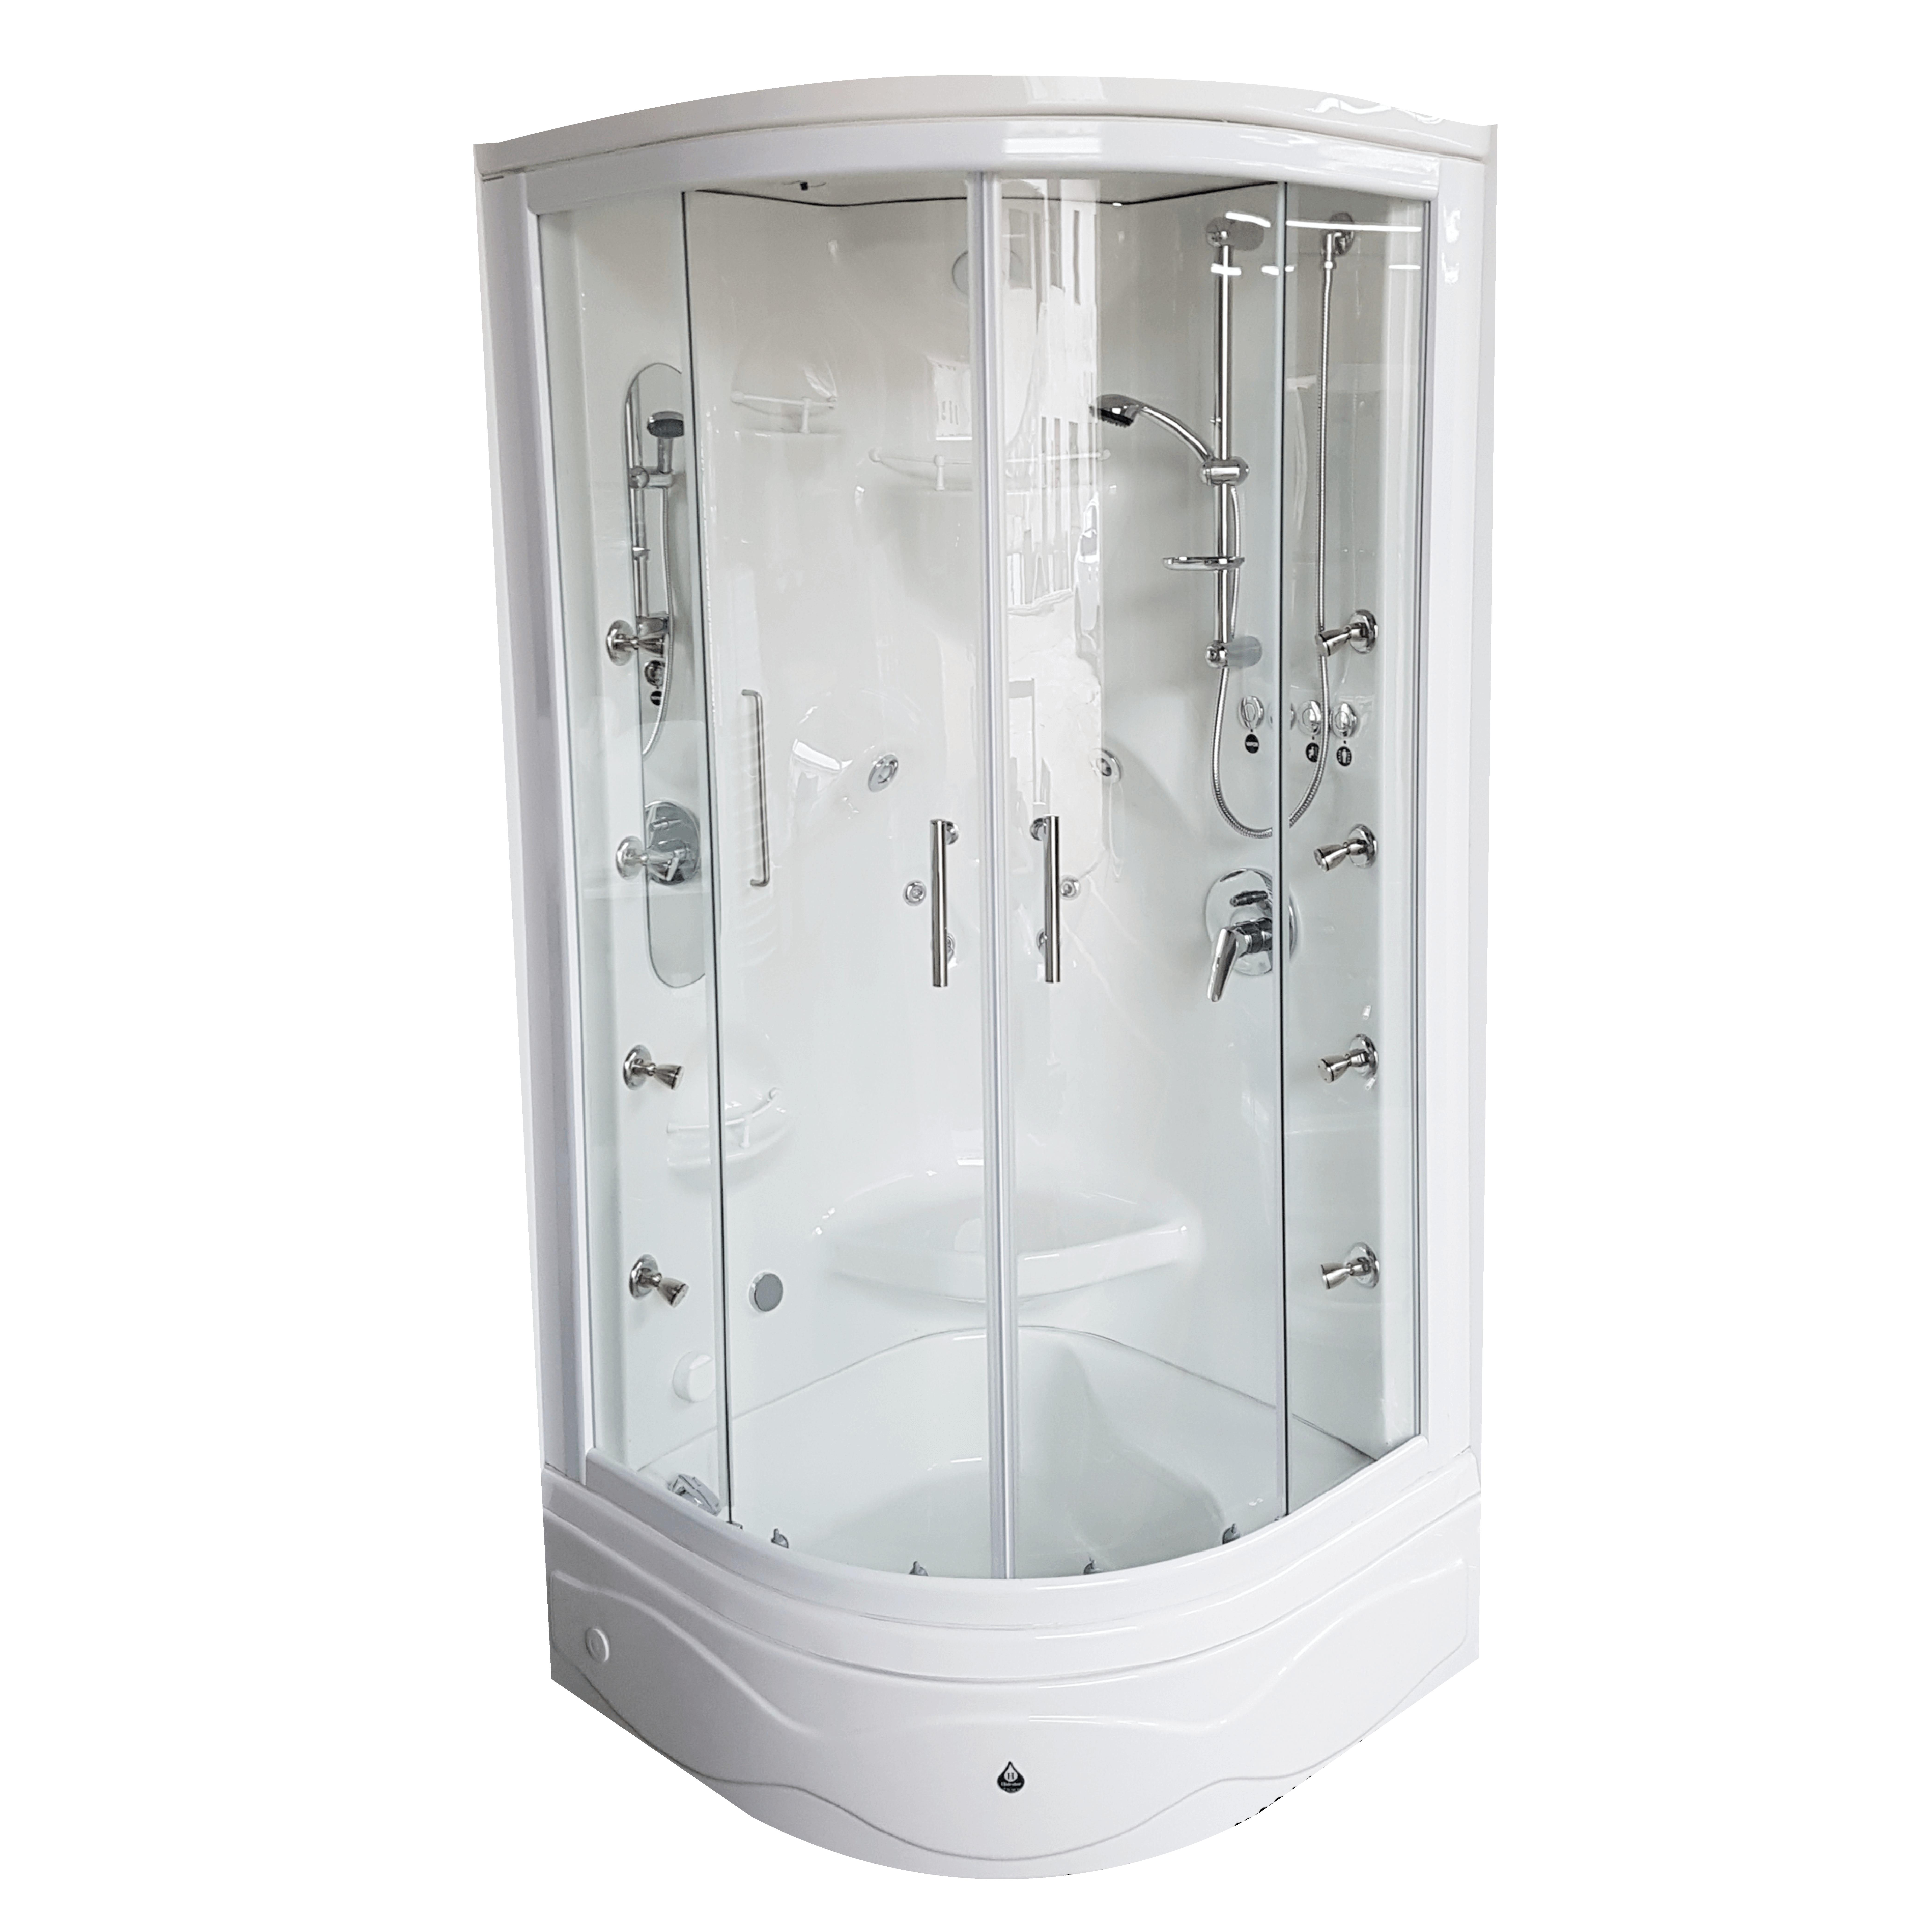 Cabina de ducha multifunci n hidrosauna hidrotor for Cabina de ducha easy